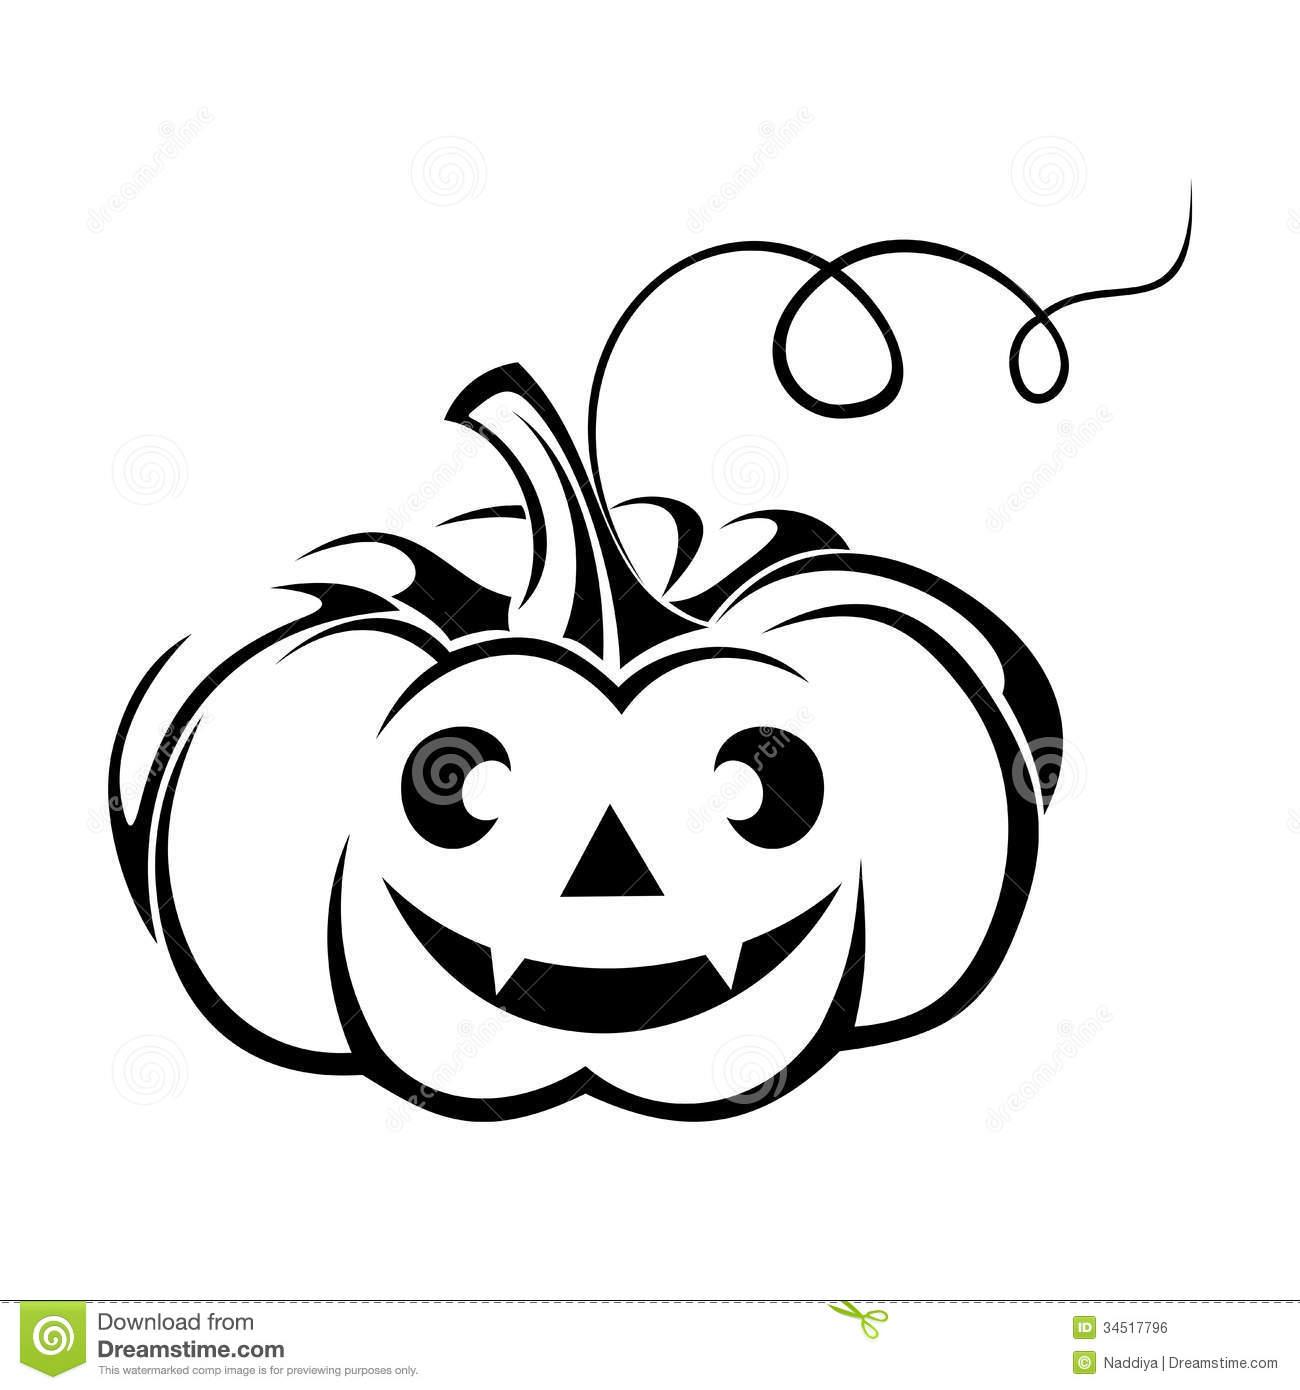 Halloween Jack O'Lantern Pumpkin Silhouette. Stock Image.